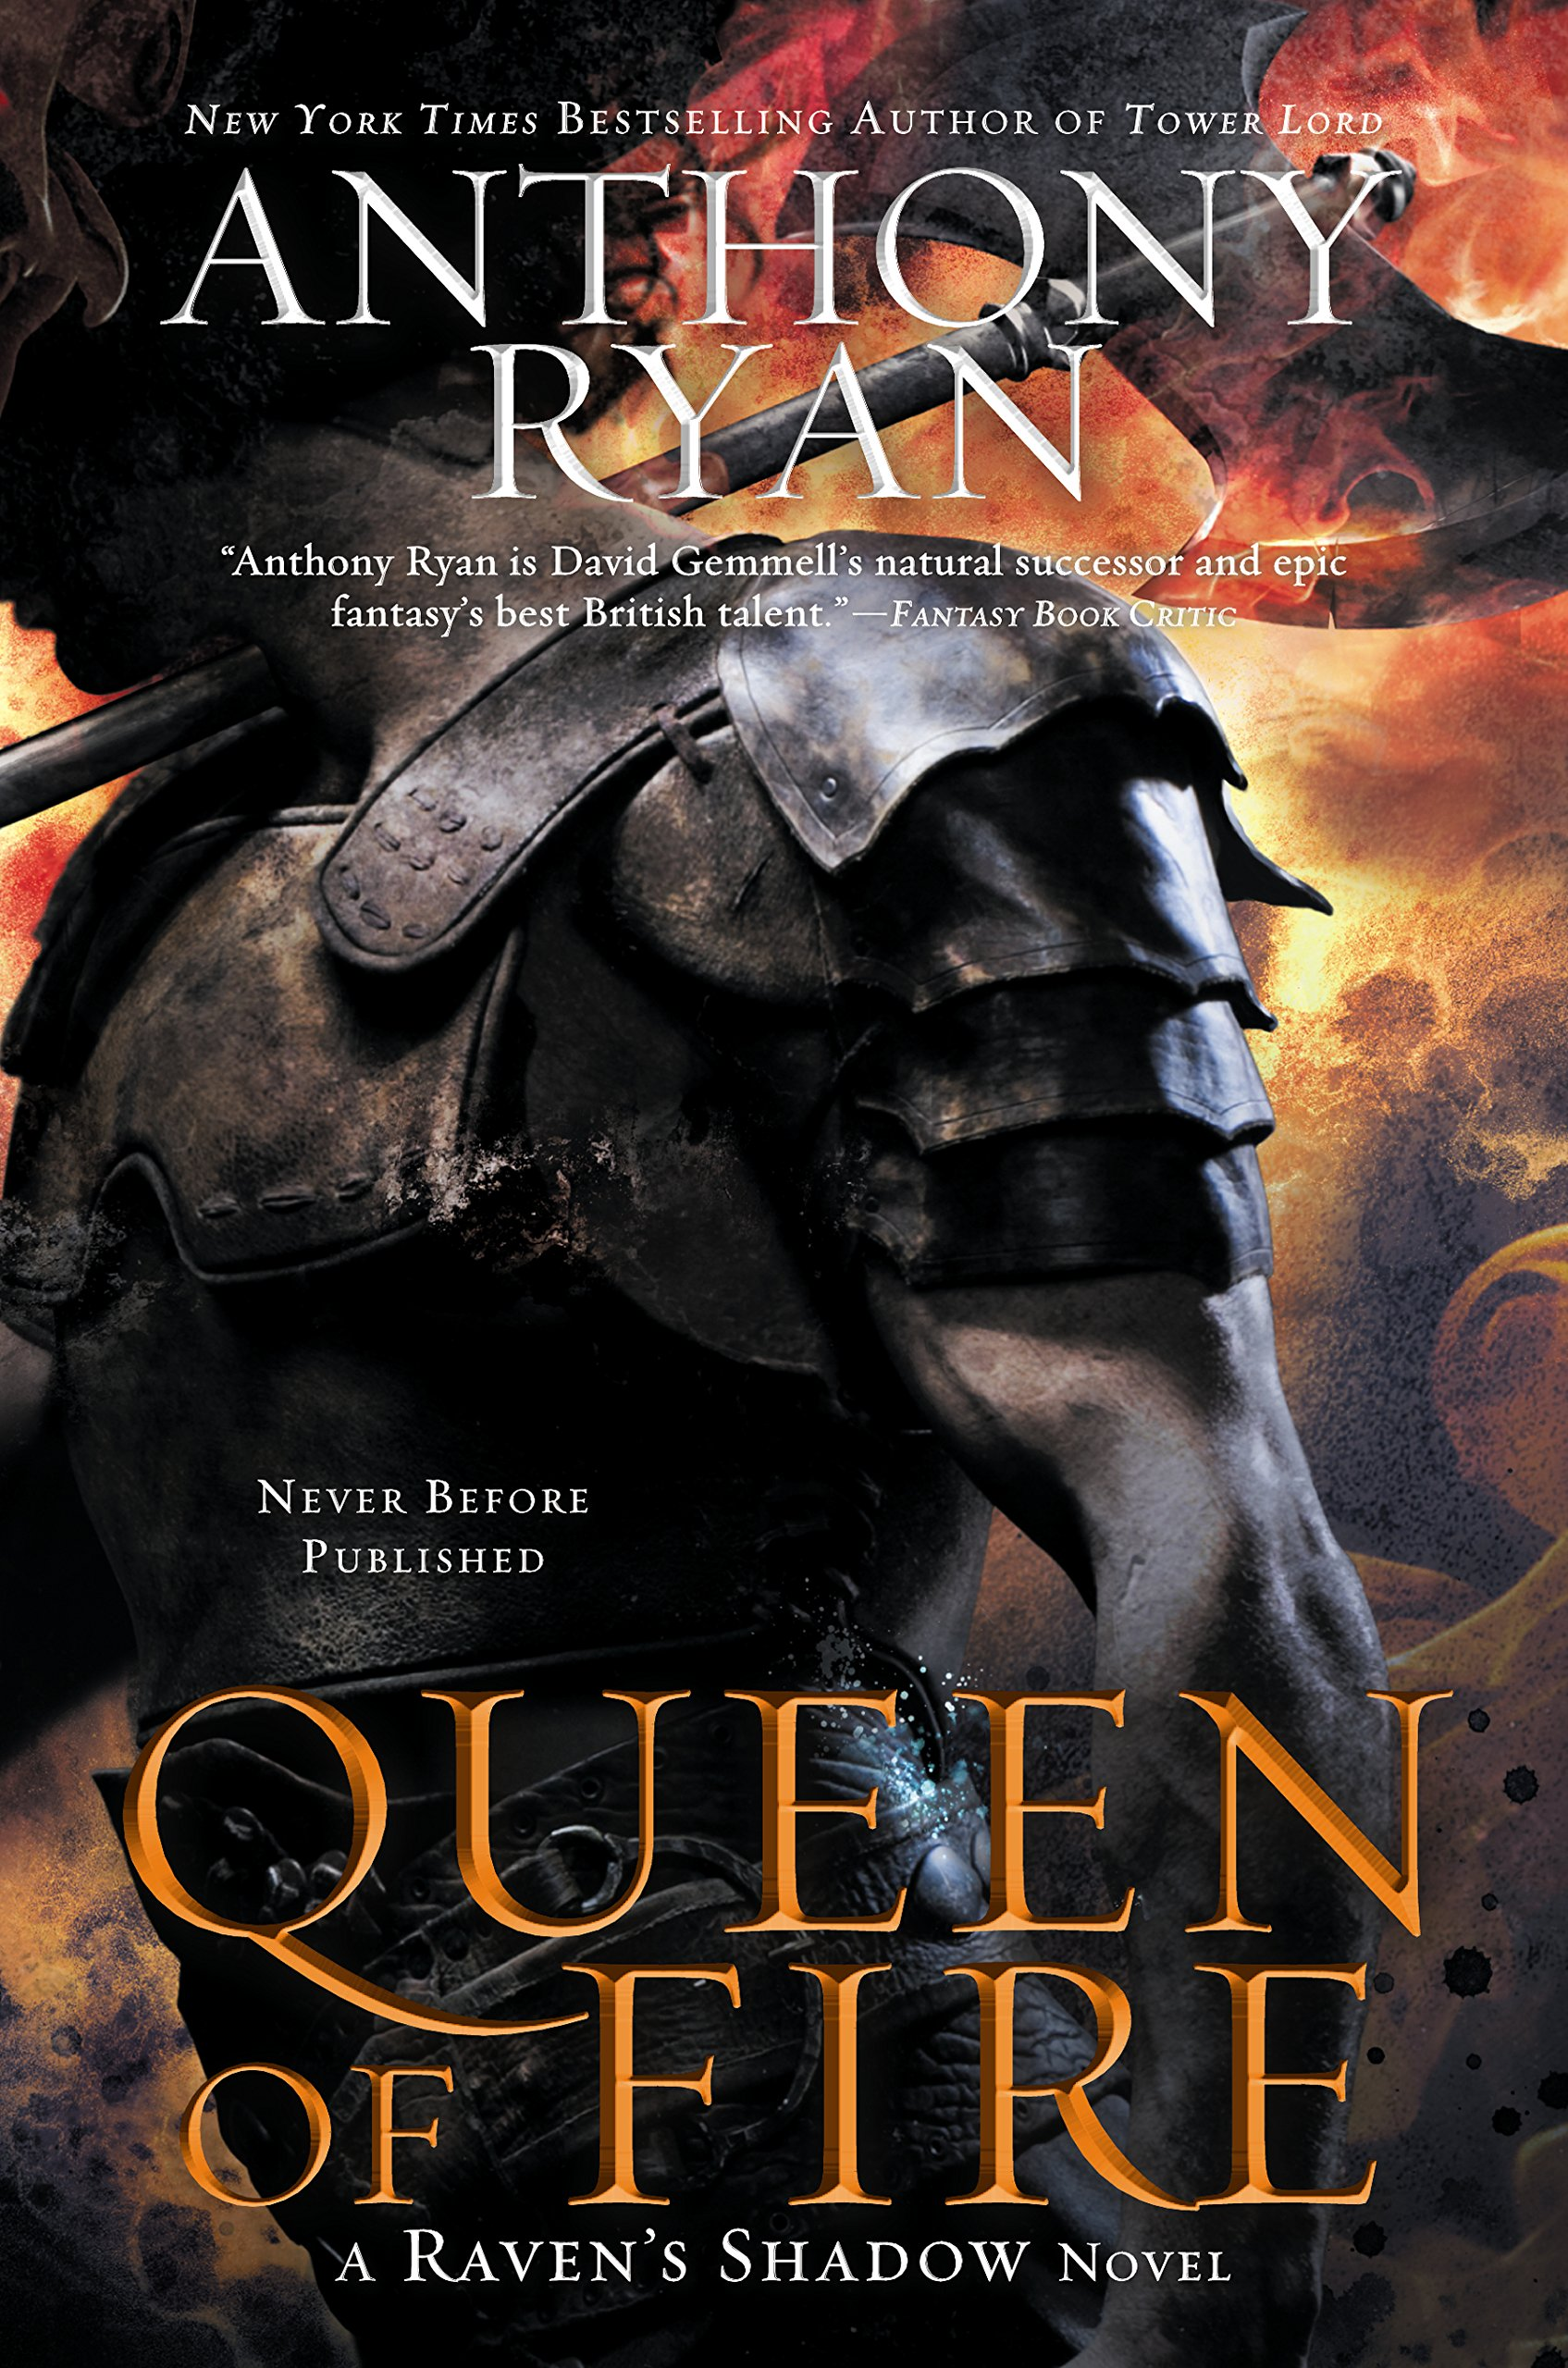 Books by Anthony Ryan